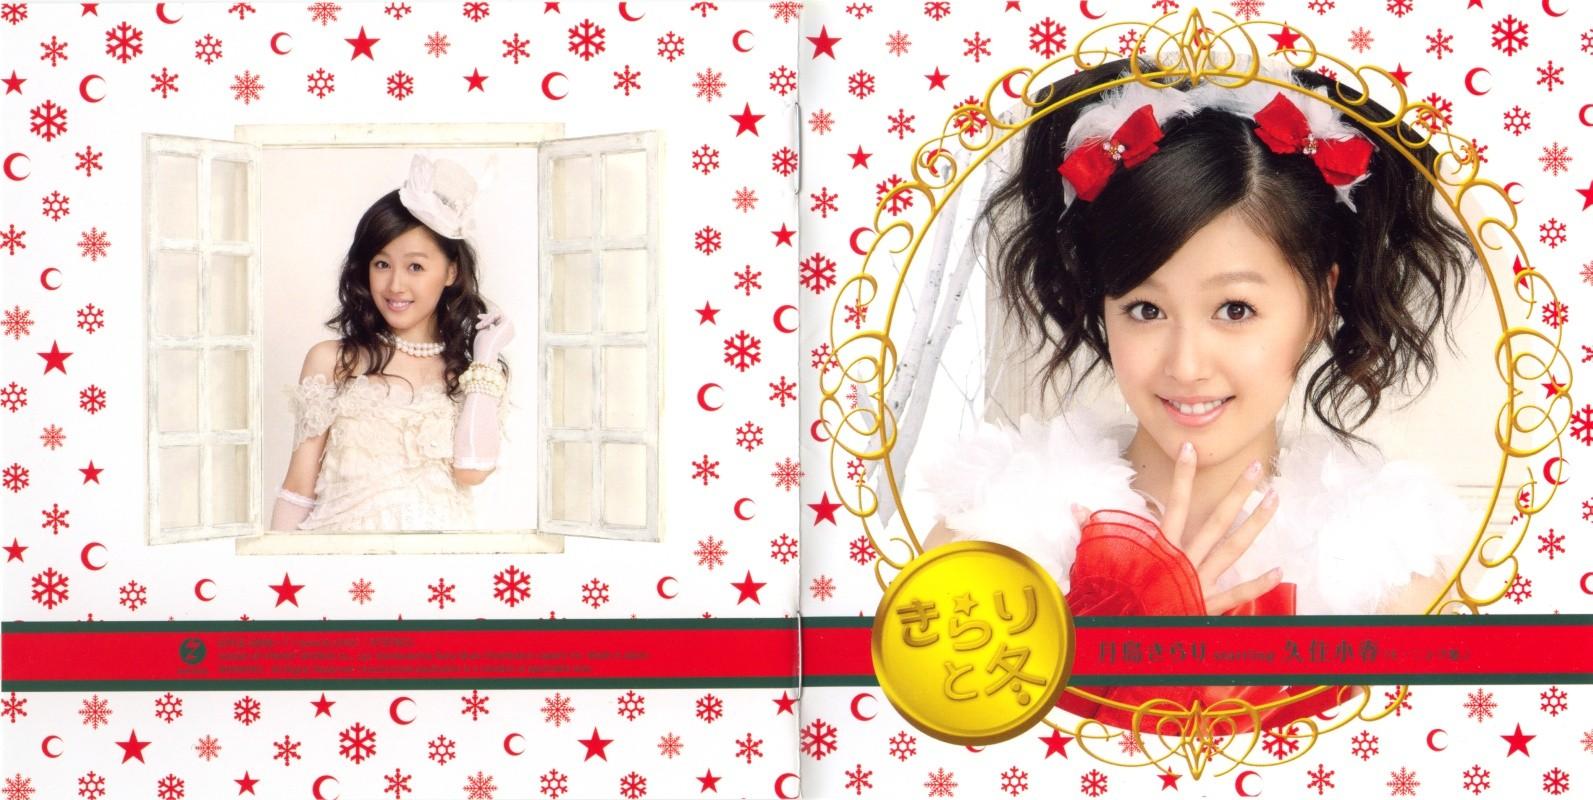 CD「きらりと冬/月島きらり starring 久住小春(モーニング娘。)」